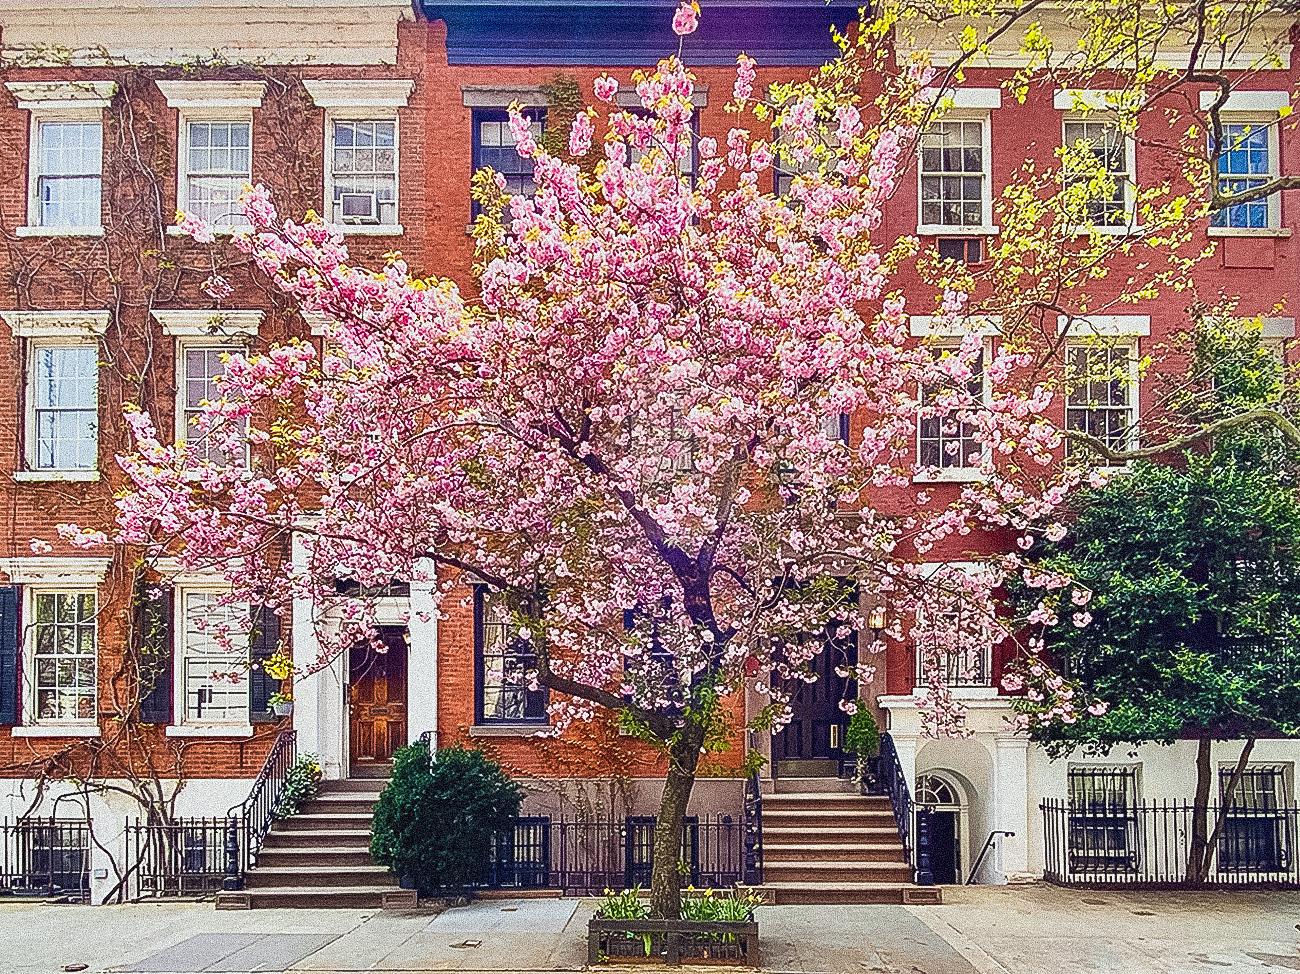 Buvette West Village New York City